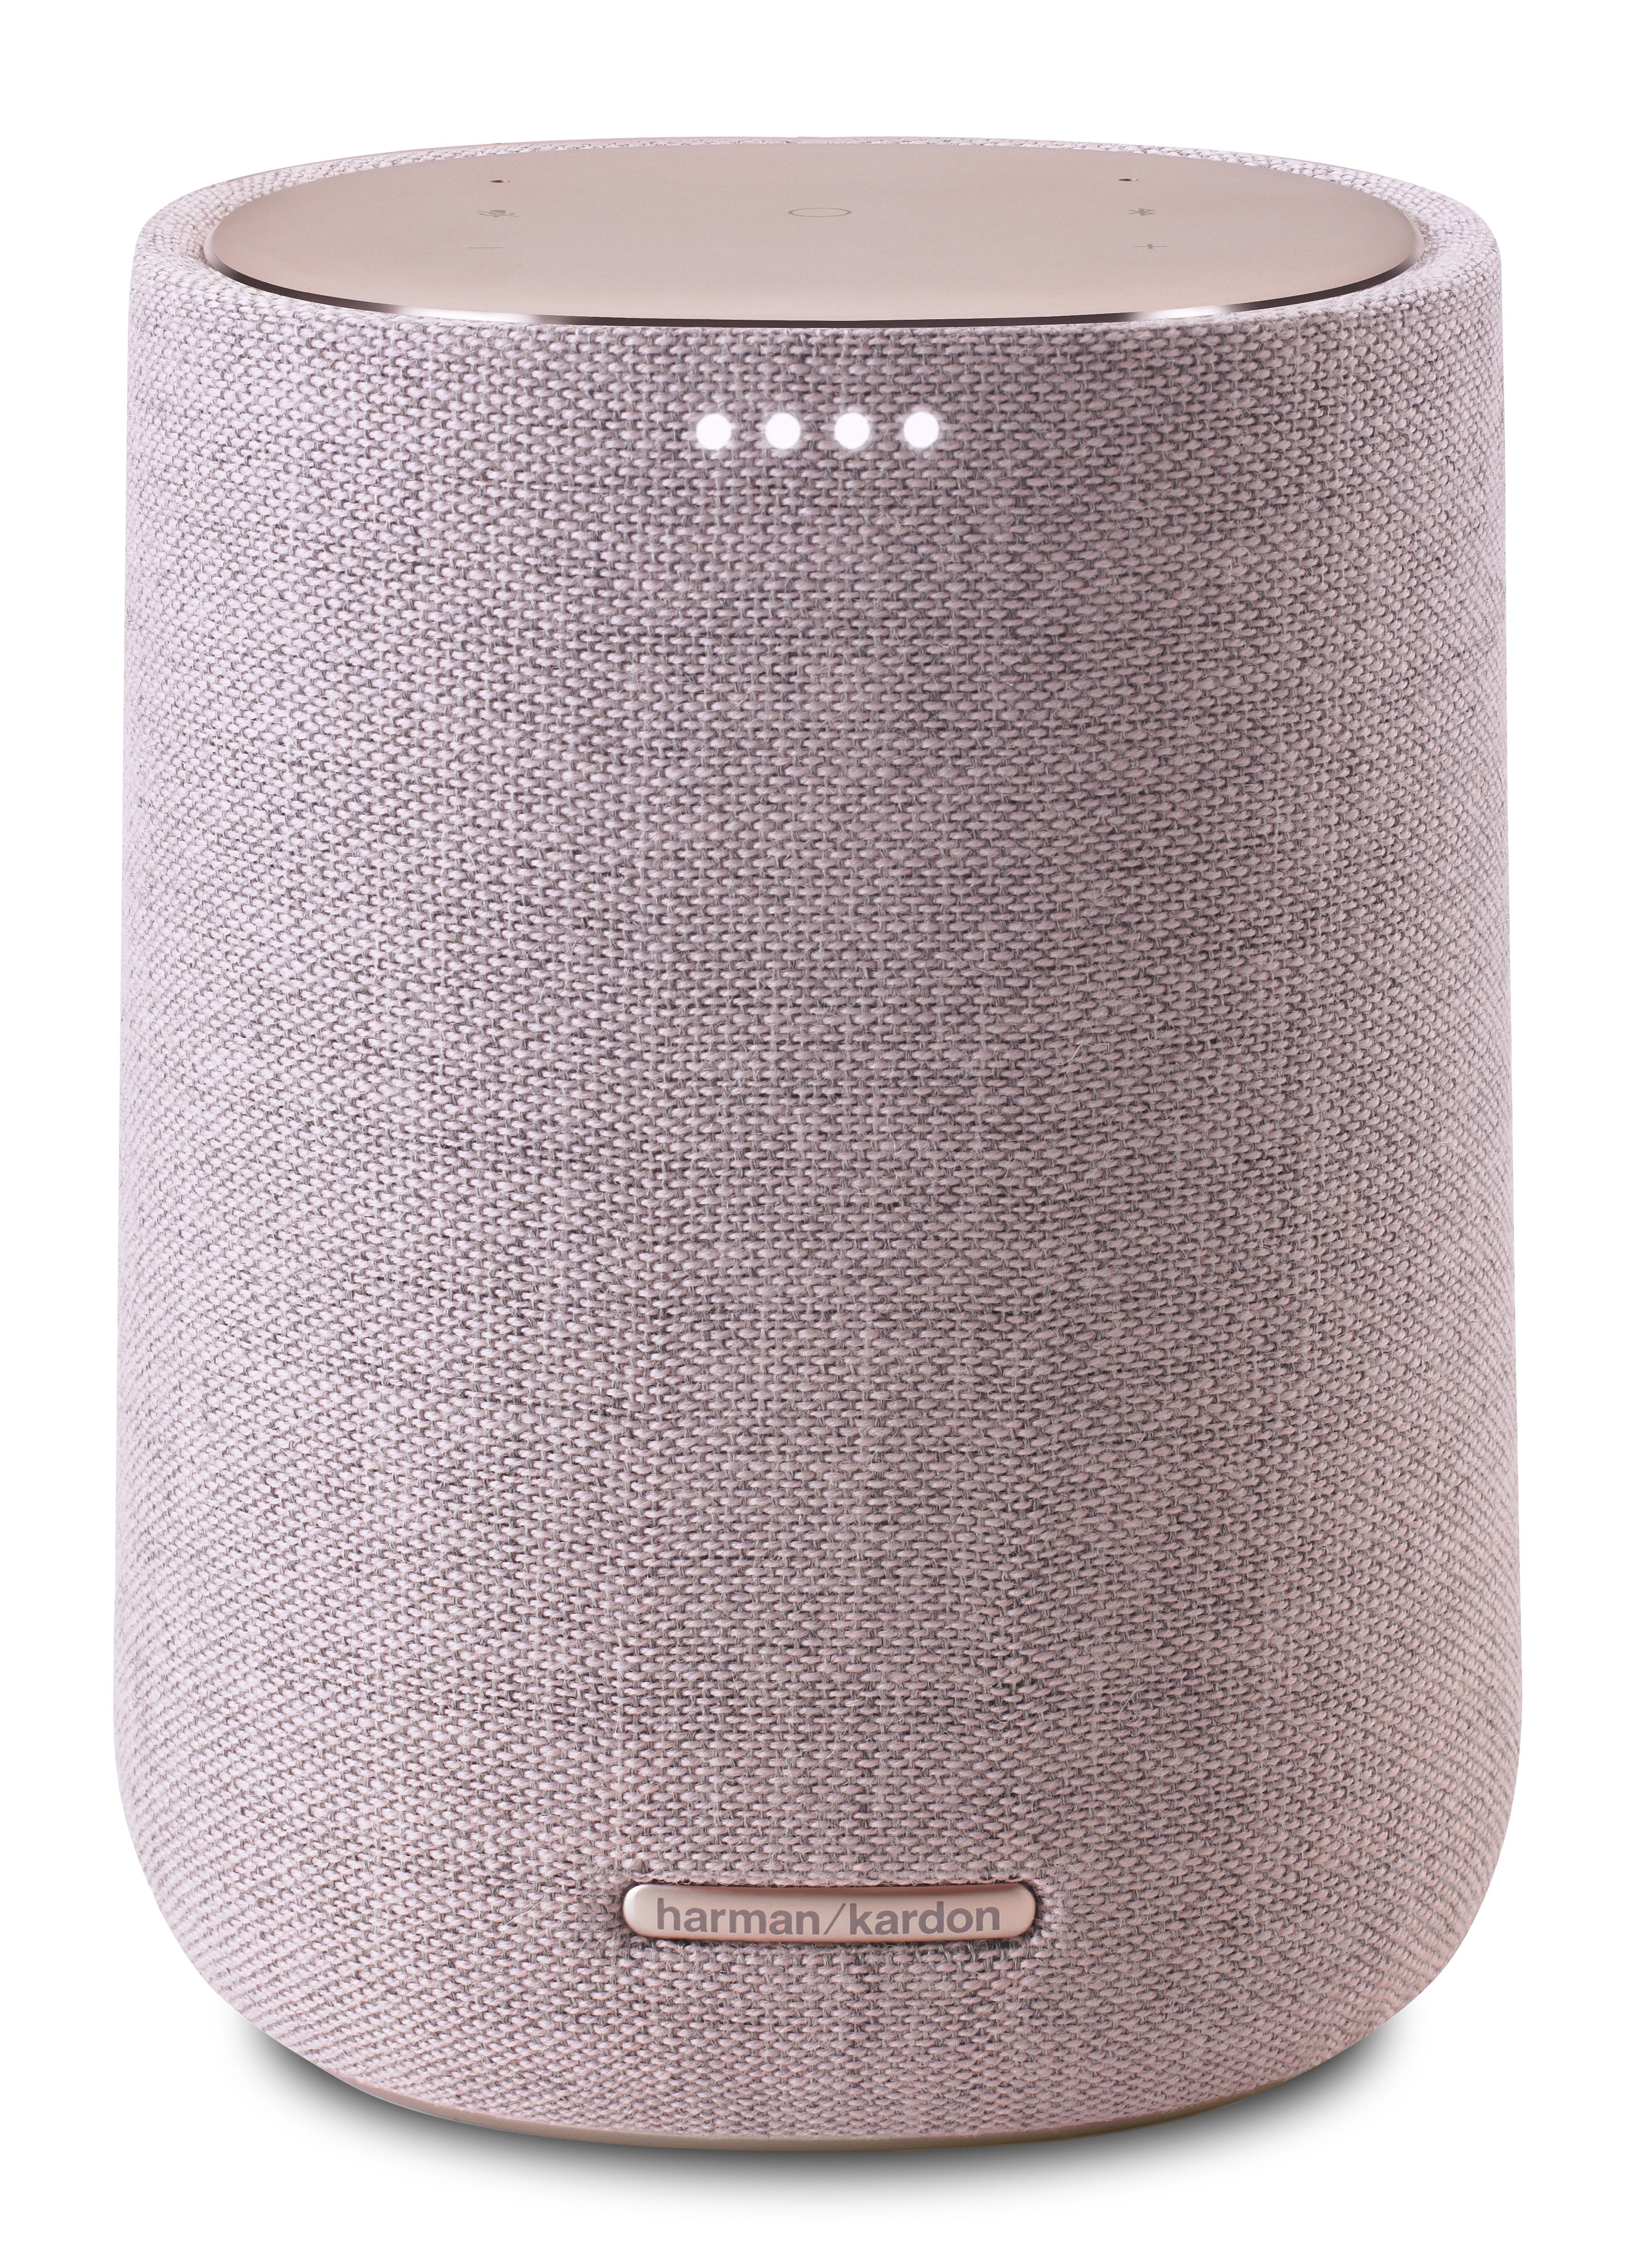 Korting Harman Citation One MKII wifi speaker